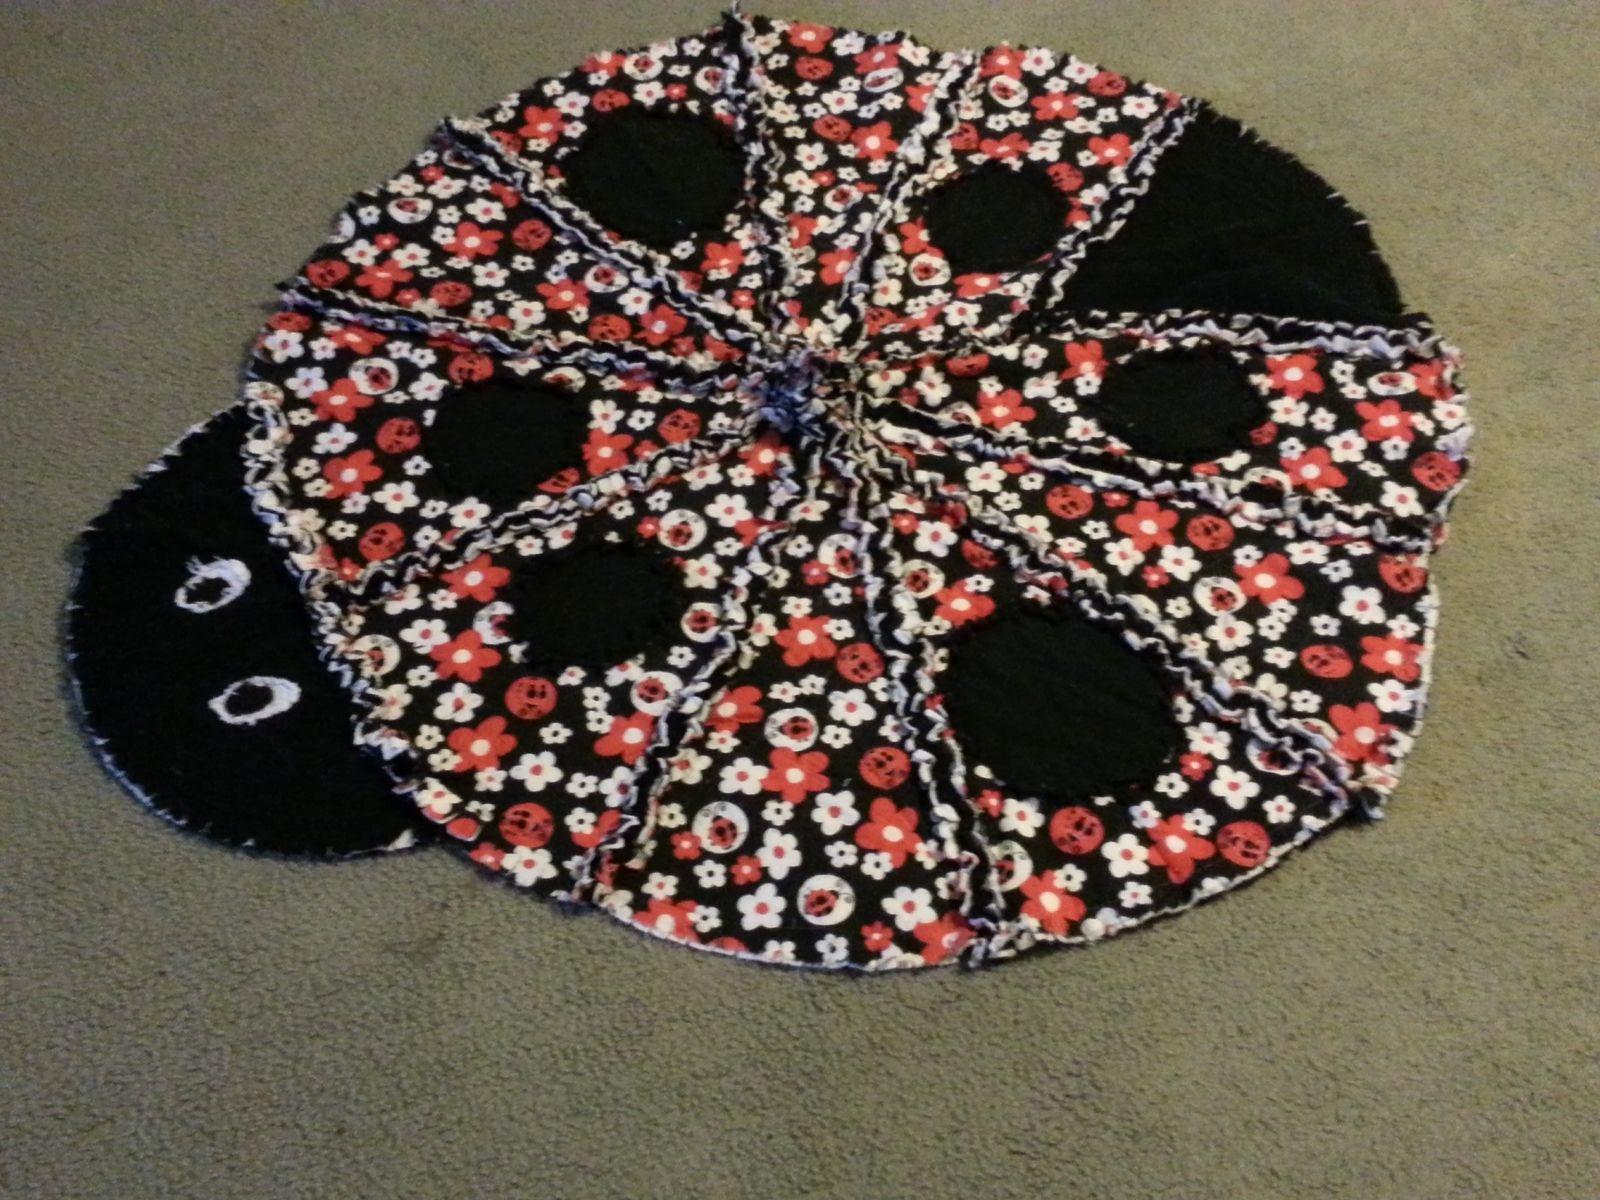 Custom Ladybug Rag Quilt For Baby by Ashley's Longarm Quilting ... : lady bug quilts - Adamdwight.com